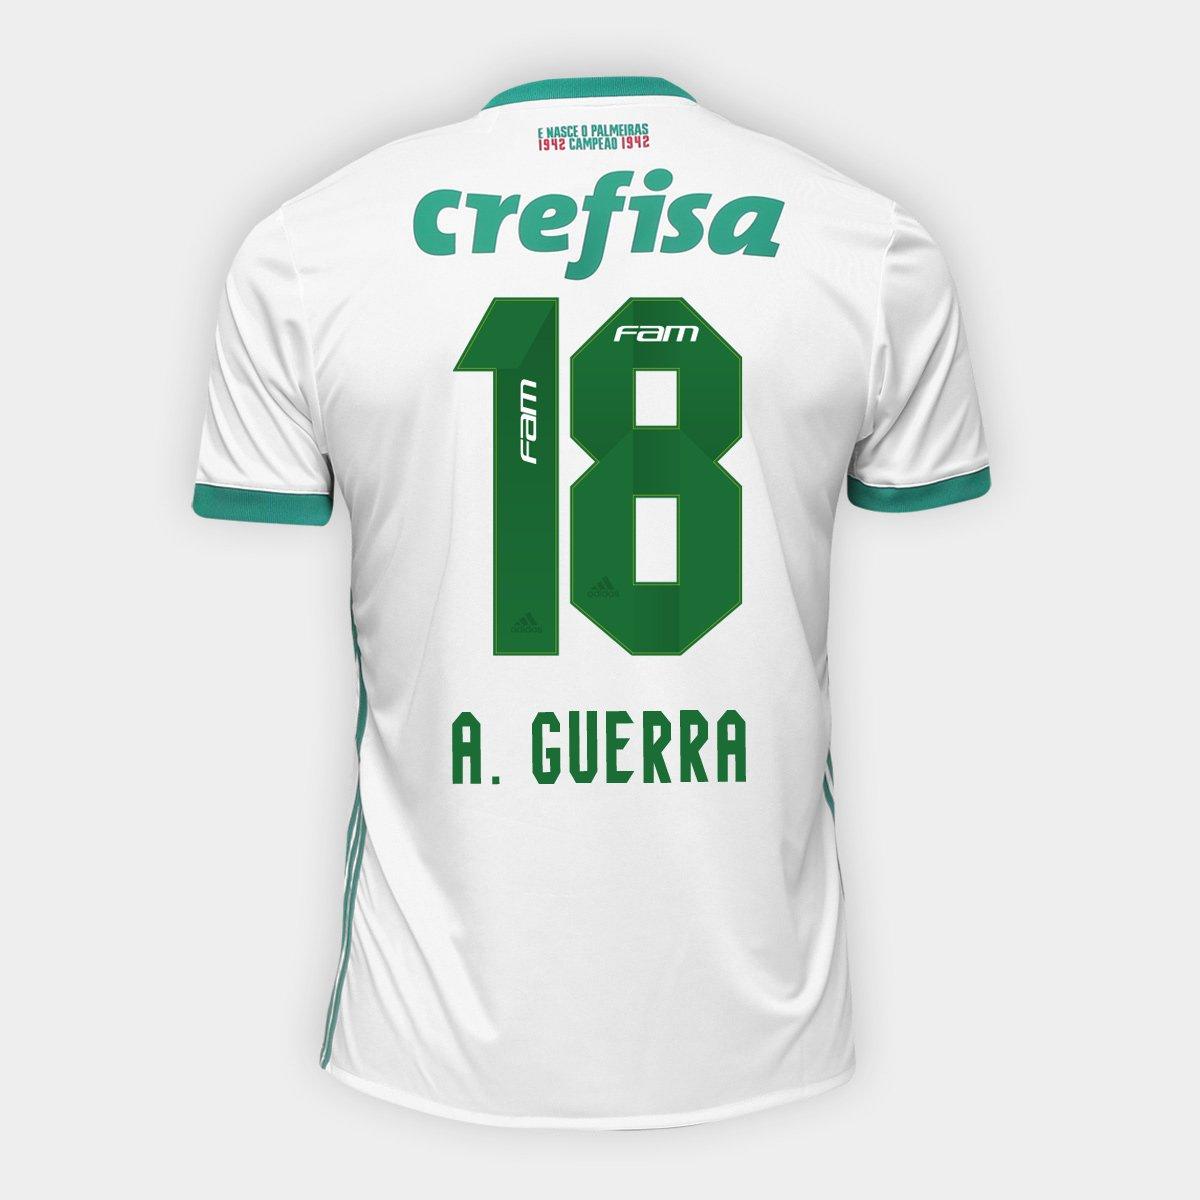 69386a734313d Camisa Palmeiras II 17 18 nº 18 A. Guerra Torcedor Adidas Masculina -  Compre Agora